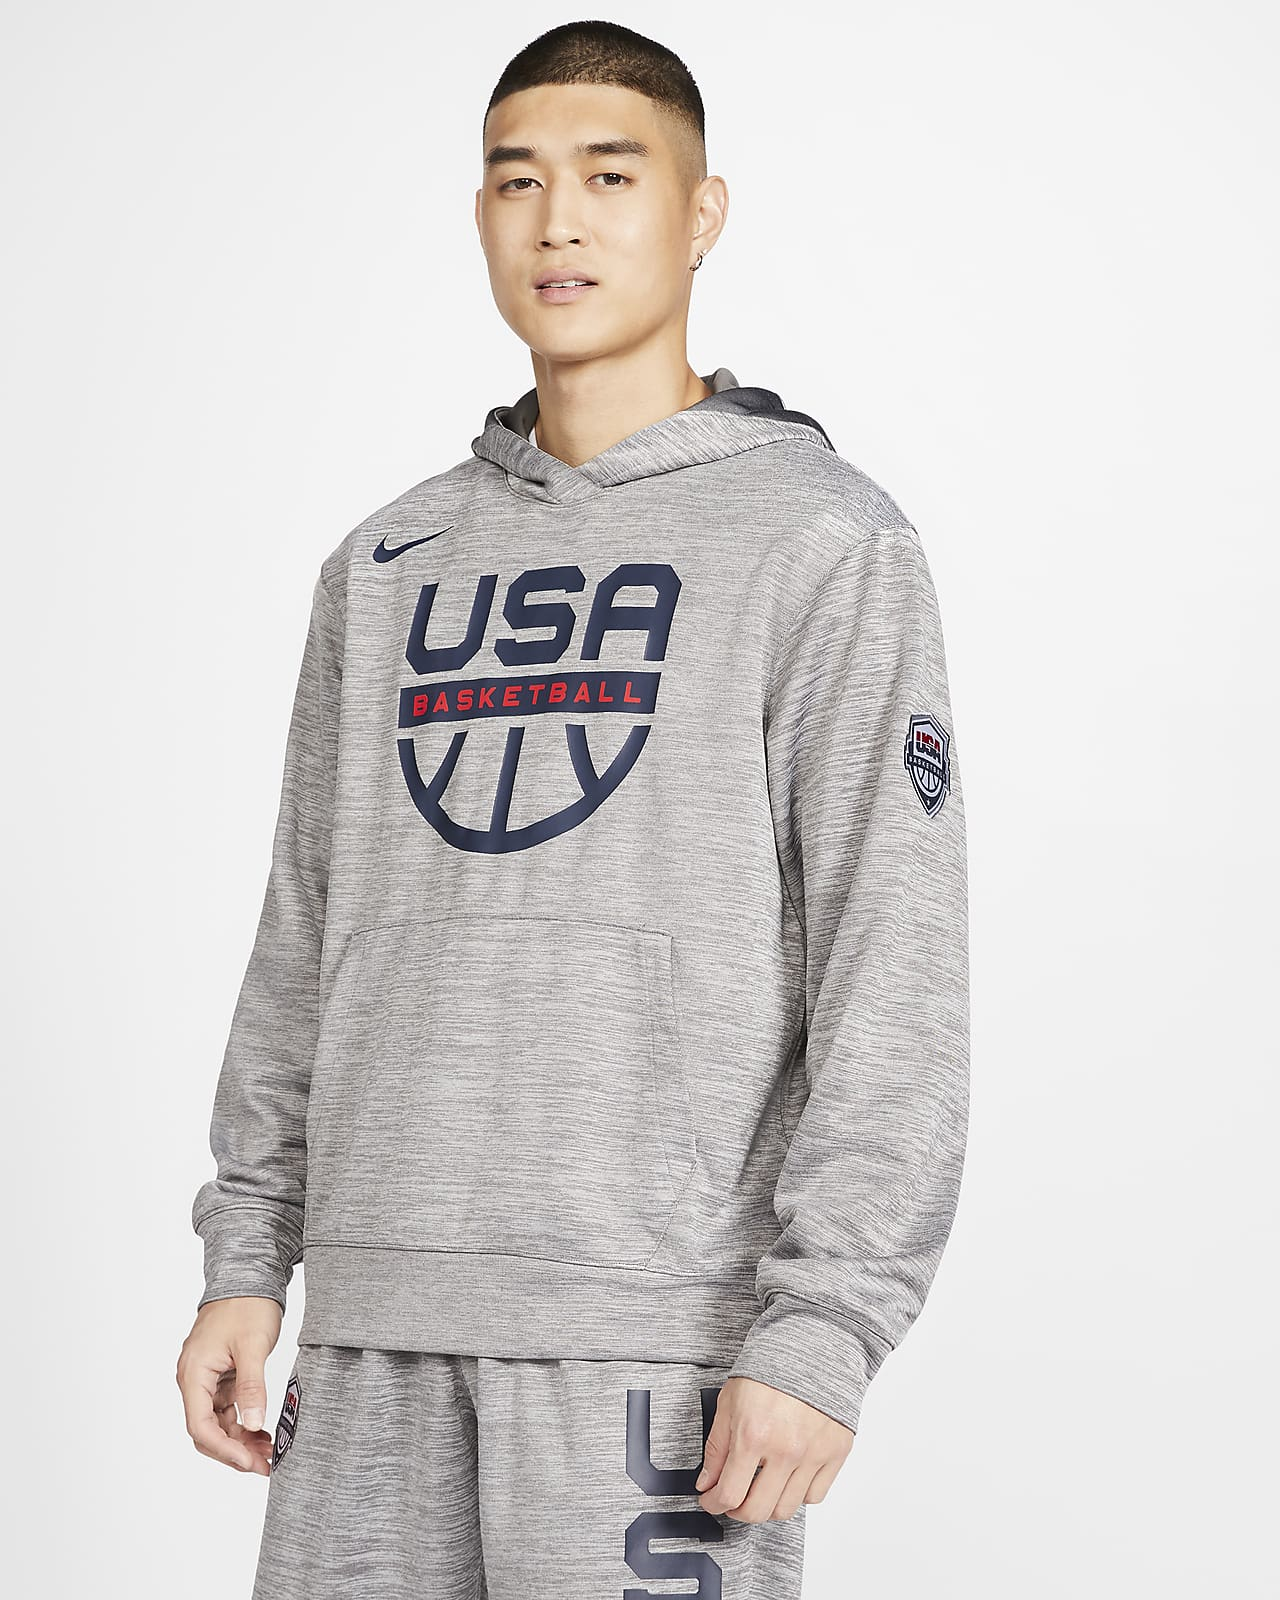 USA Nike Spotlight Men's Basketball Hoodie